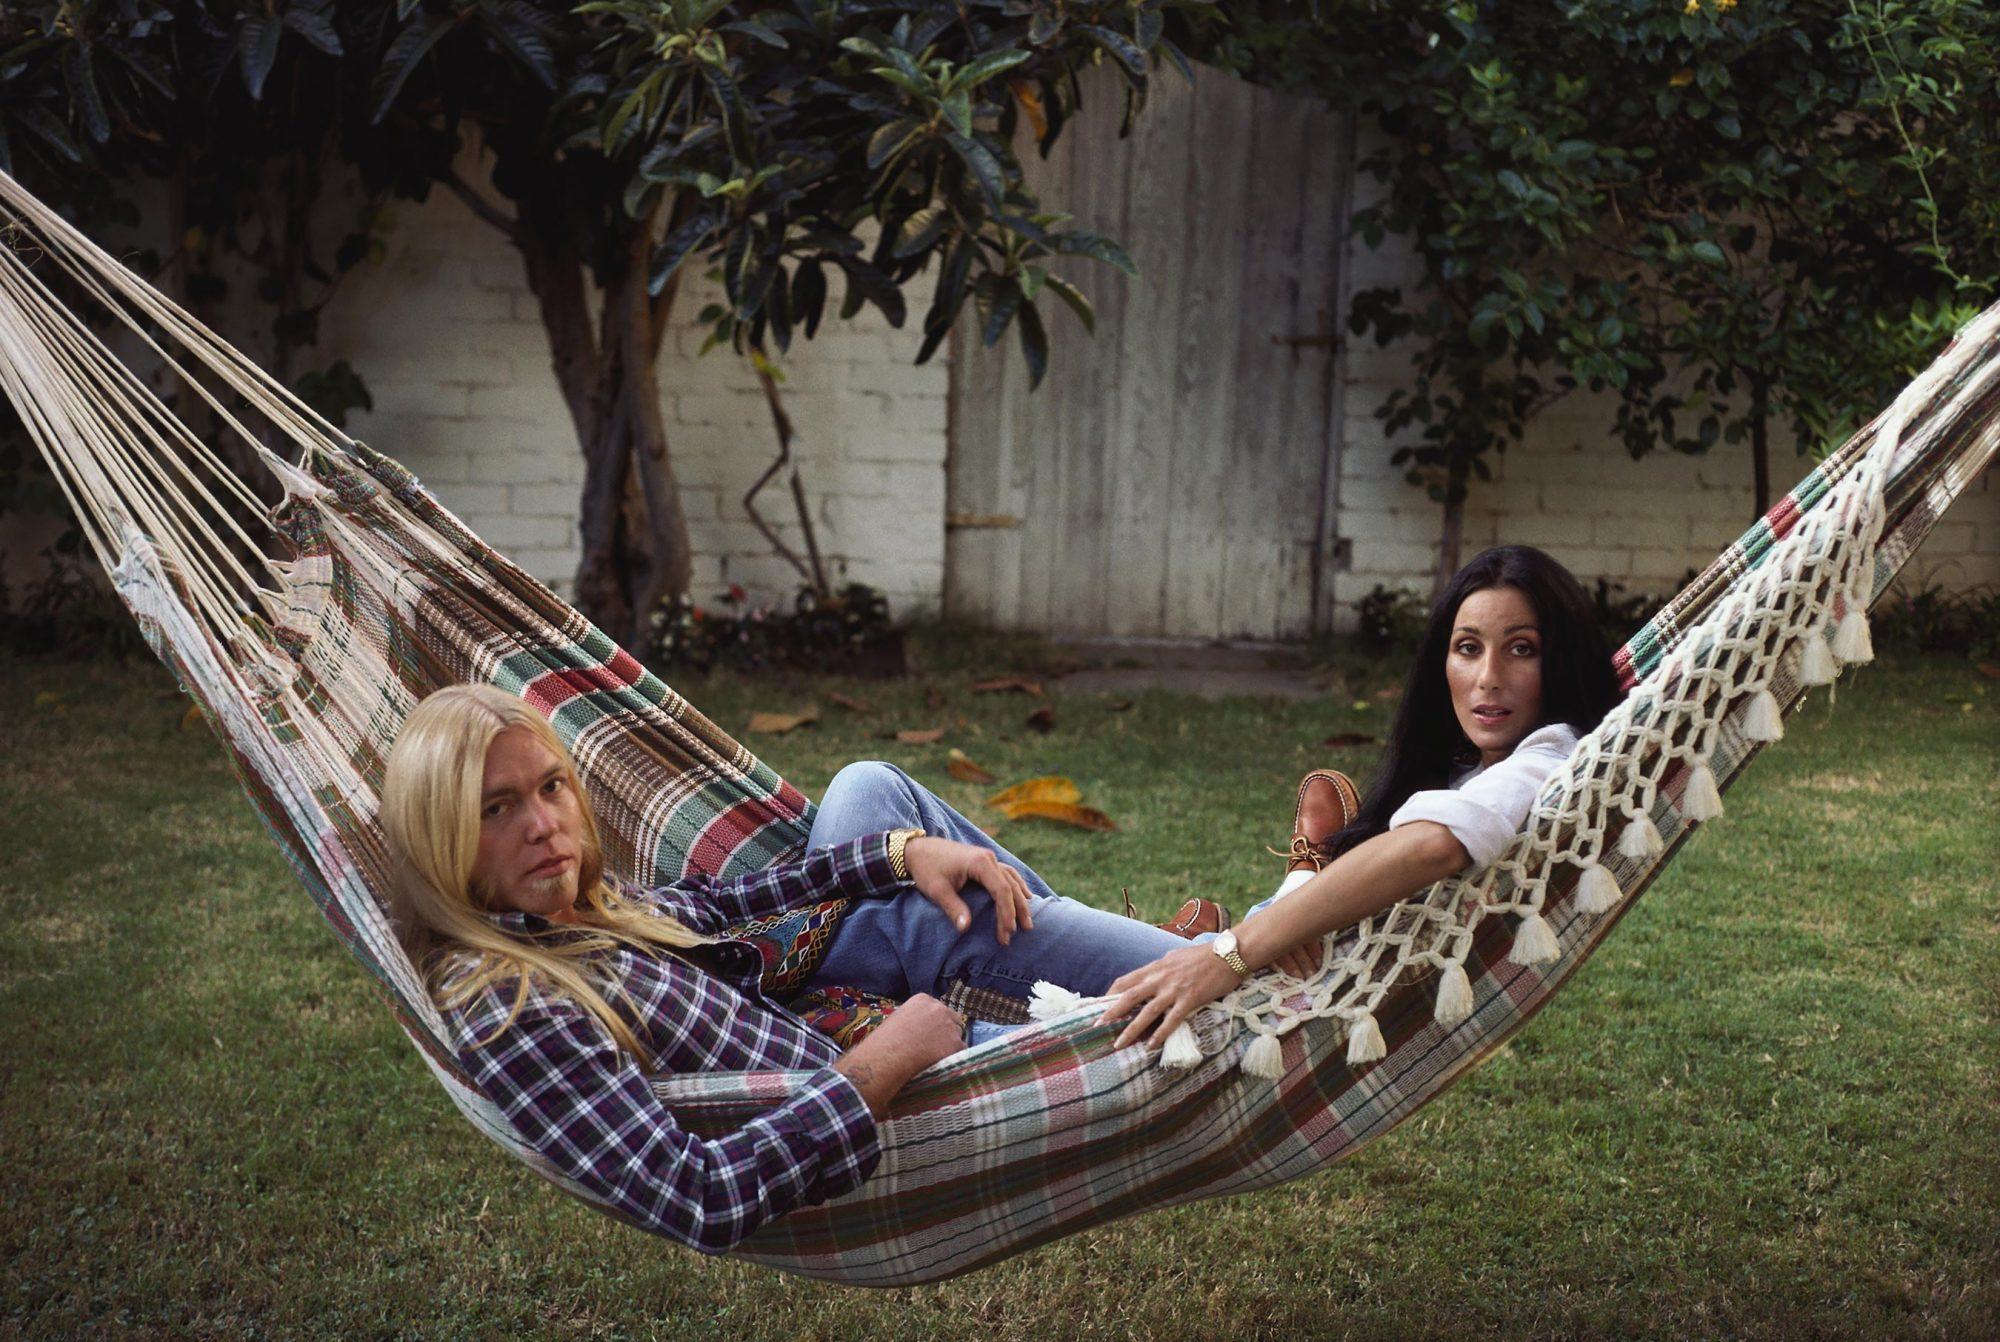 1977, Beverly Hills, Cher with Gregg Allman